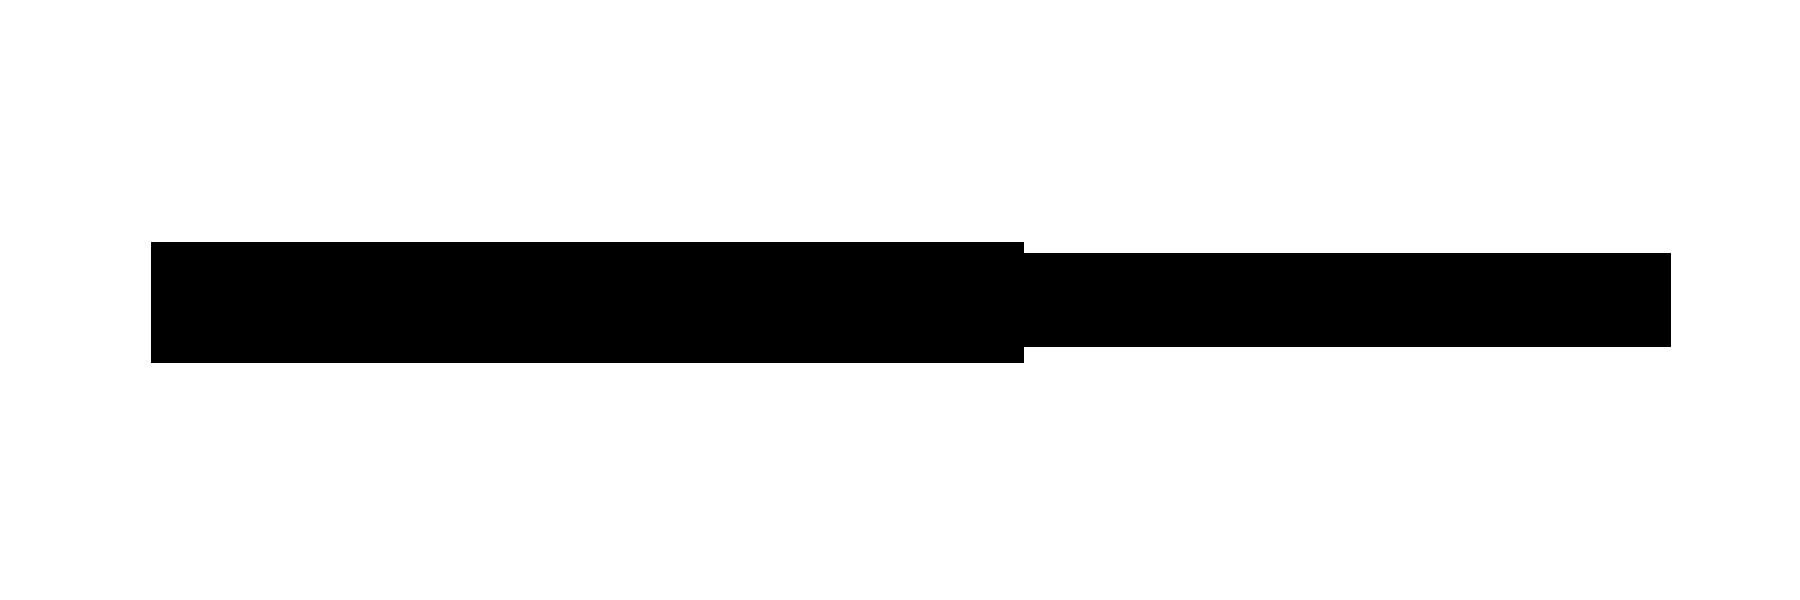 01_SunsetStudios_Logos_03B